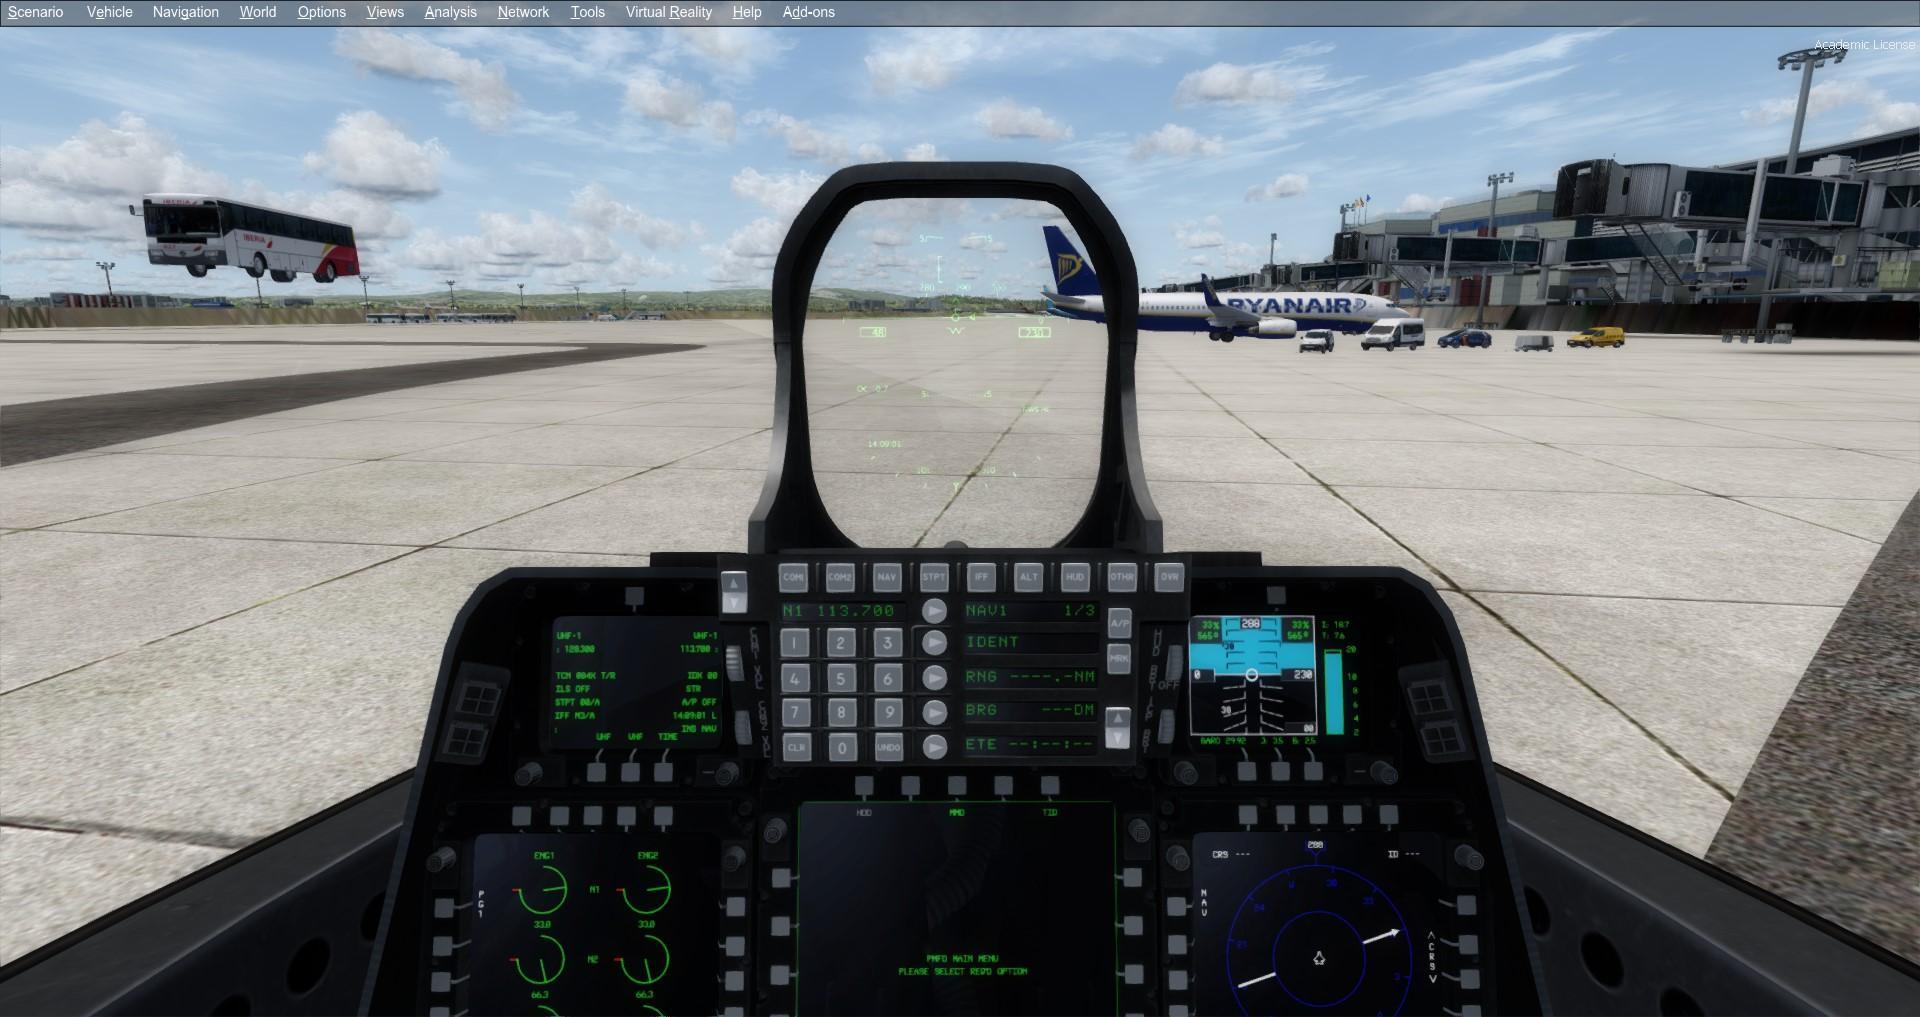 SIMWARE - VALENCIA X FSX P3D - Aerosoft Scenery - AEROSOFT COMMUNITY